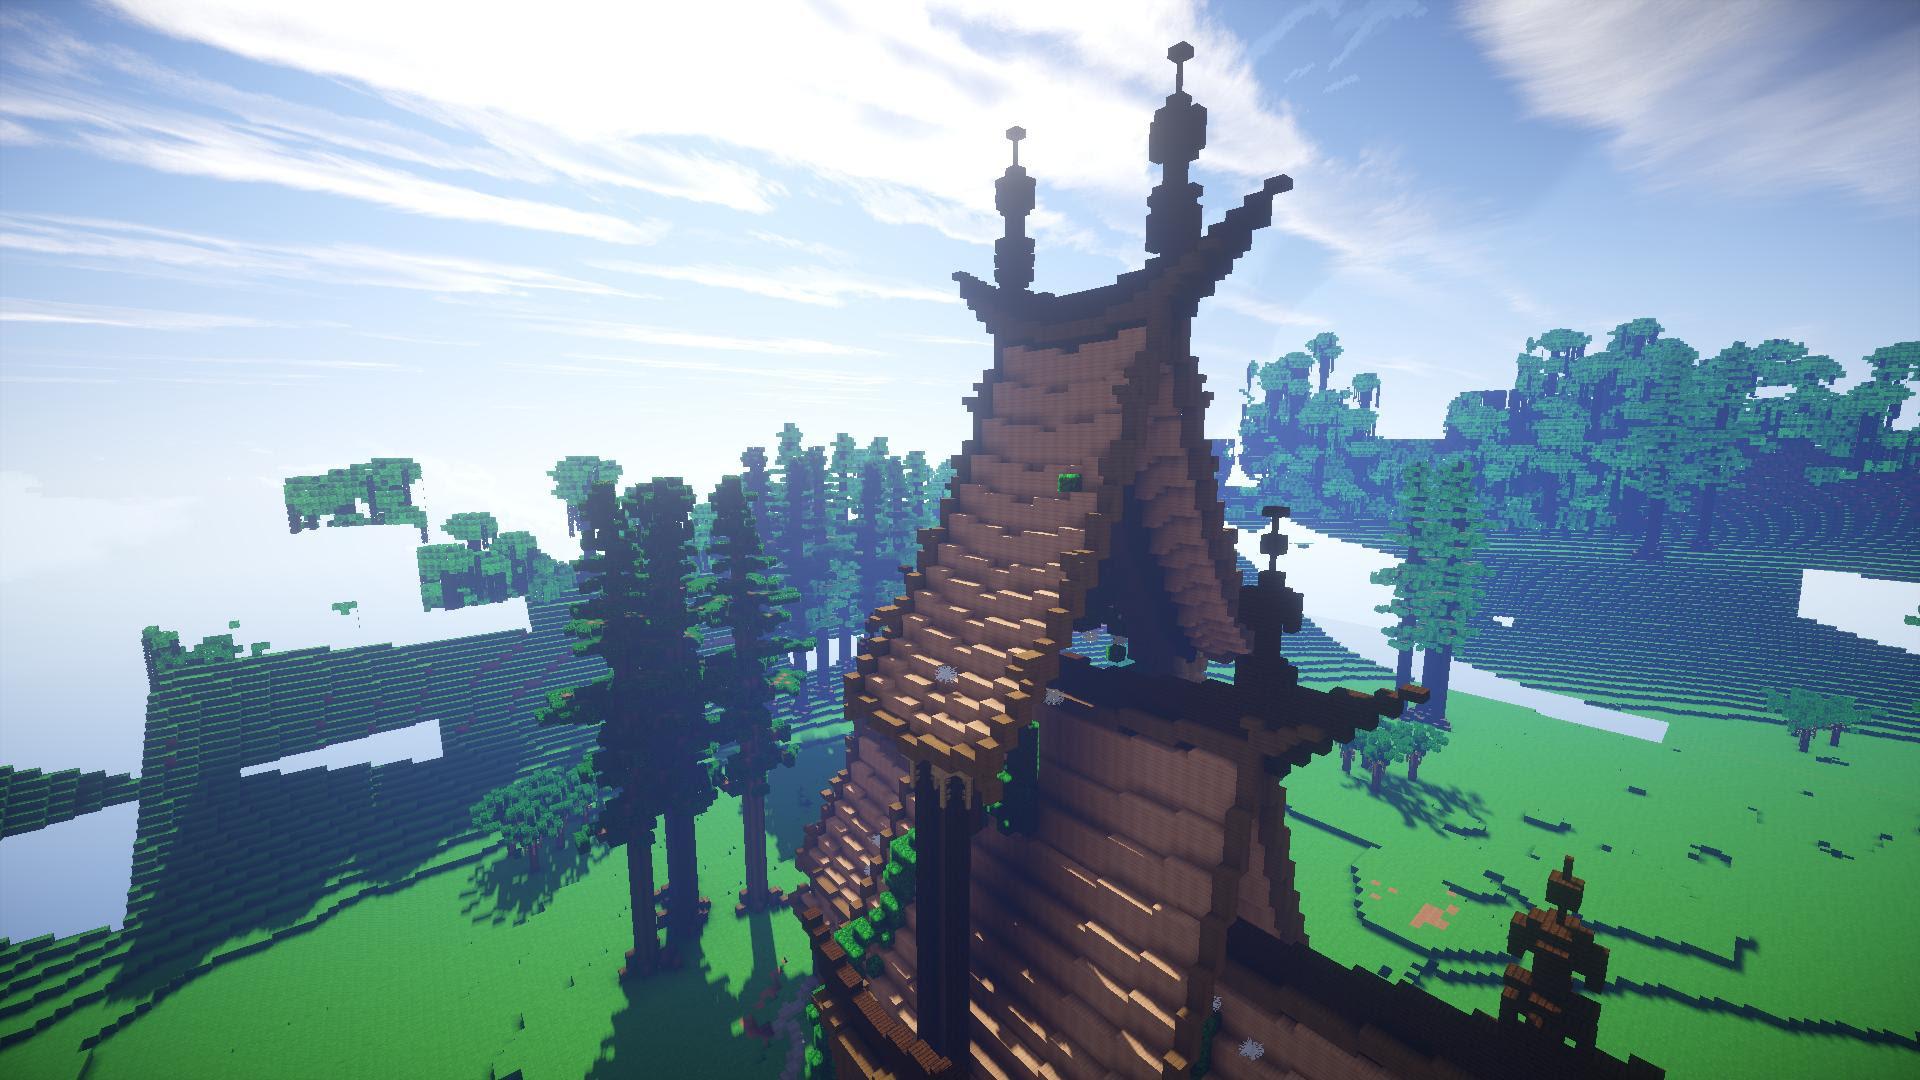 Jungle custom terrain | Place to build/finish map | Cheap ...